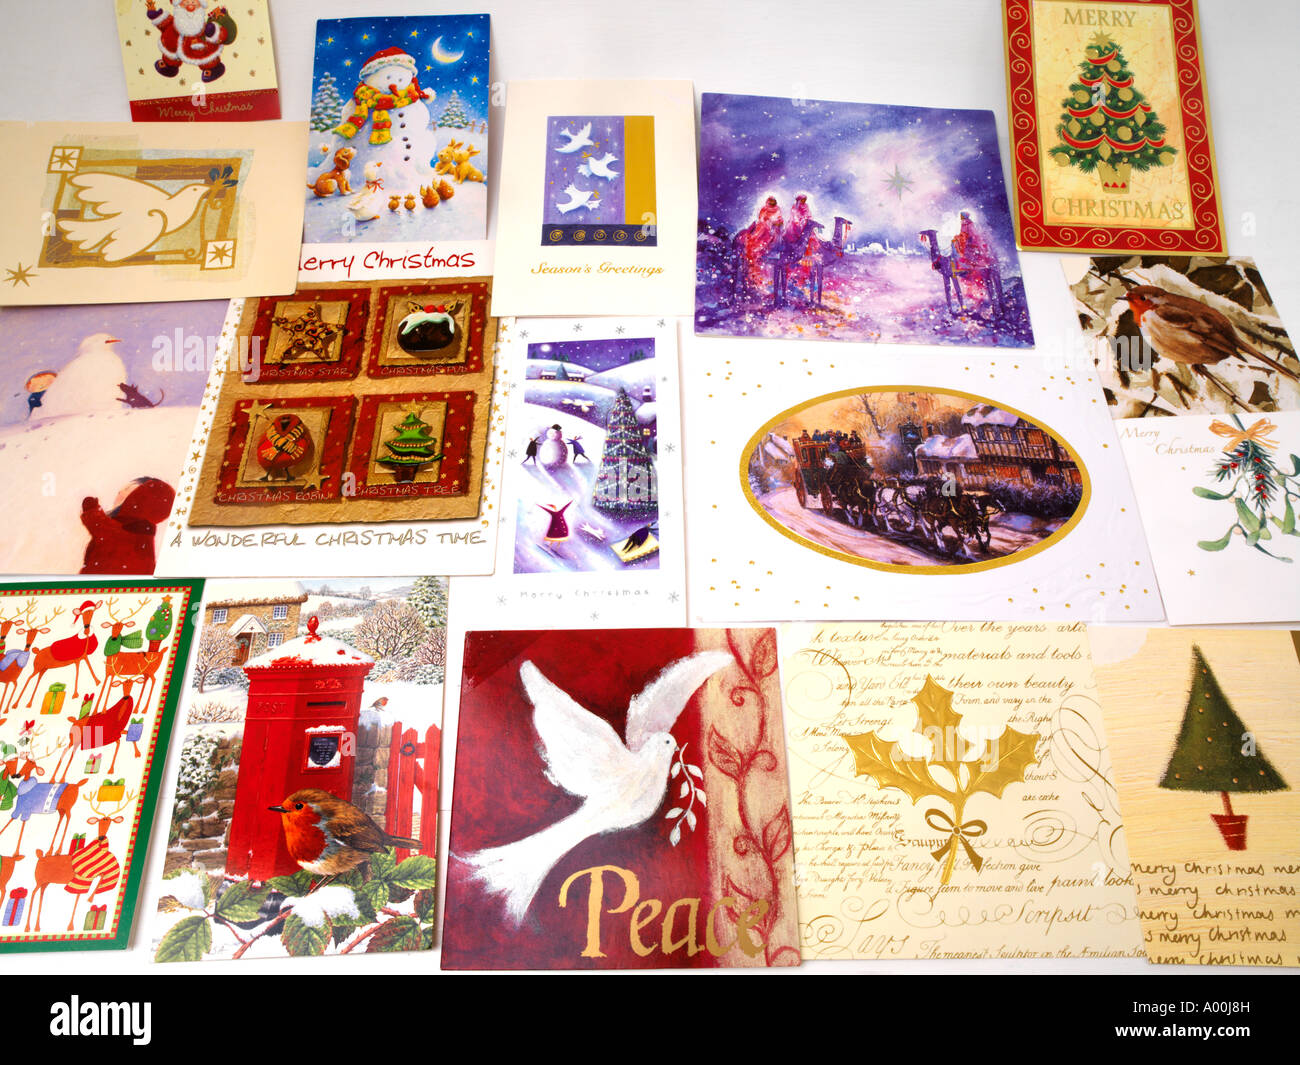 Traditional Christmas Cards Stock Photo: 9840640 - Alamy